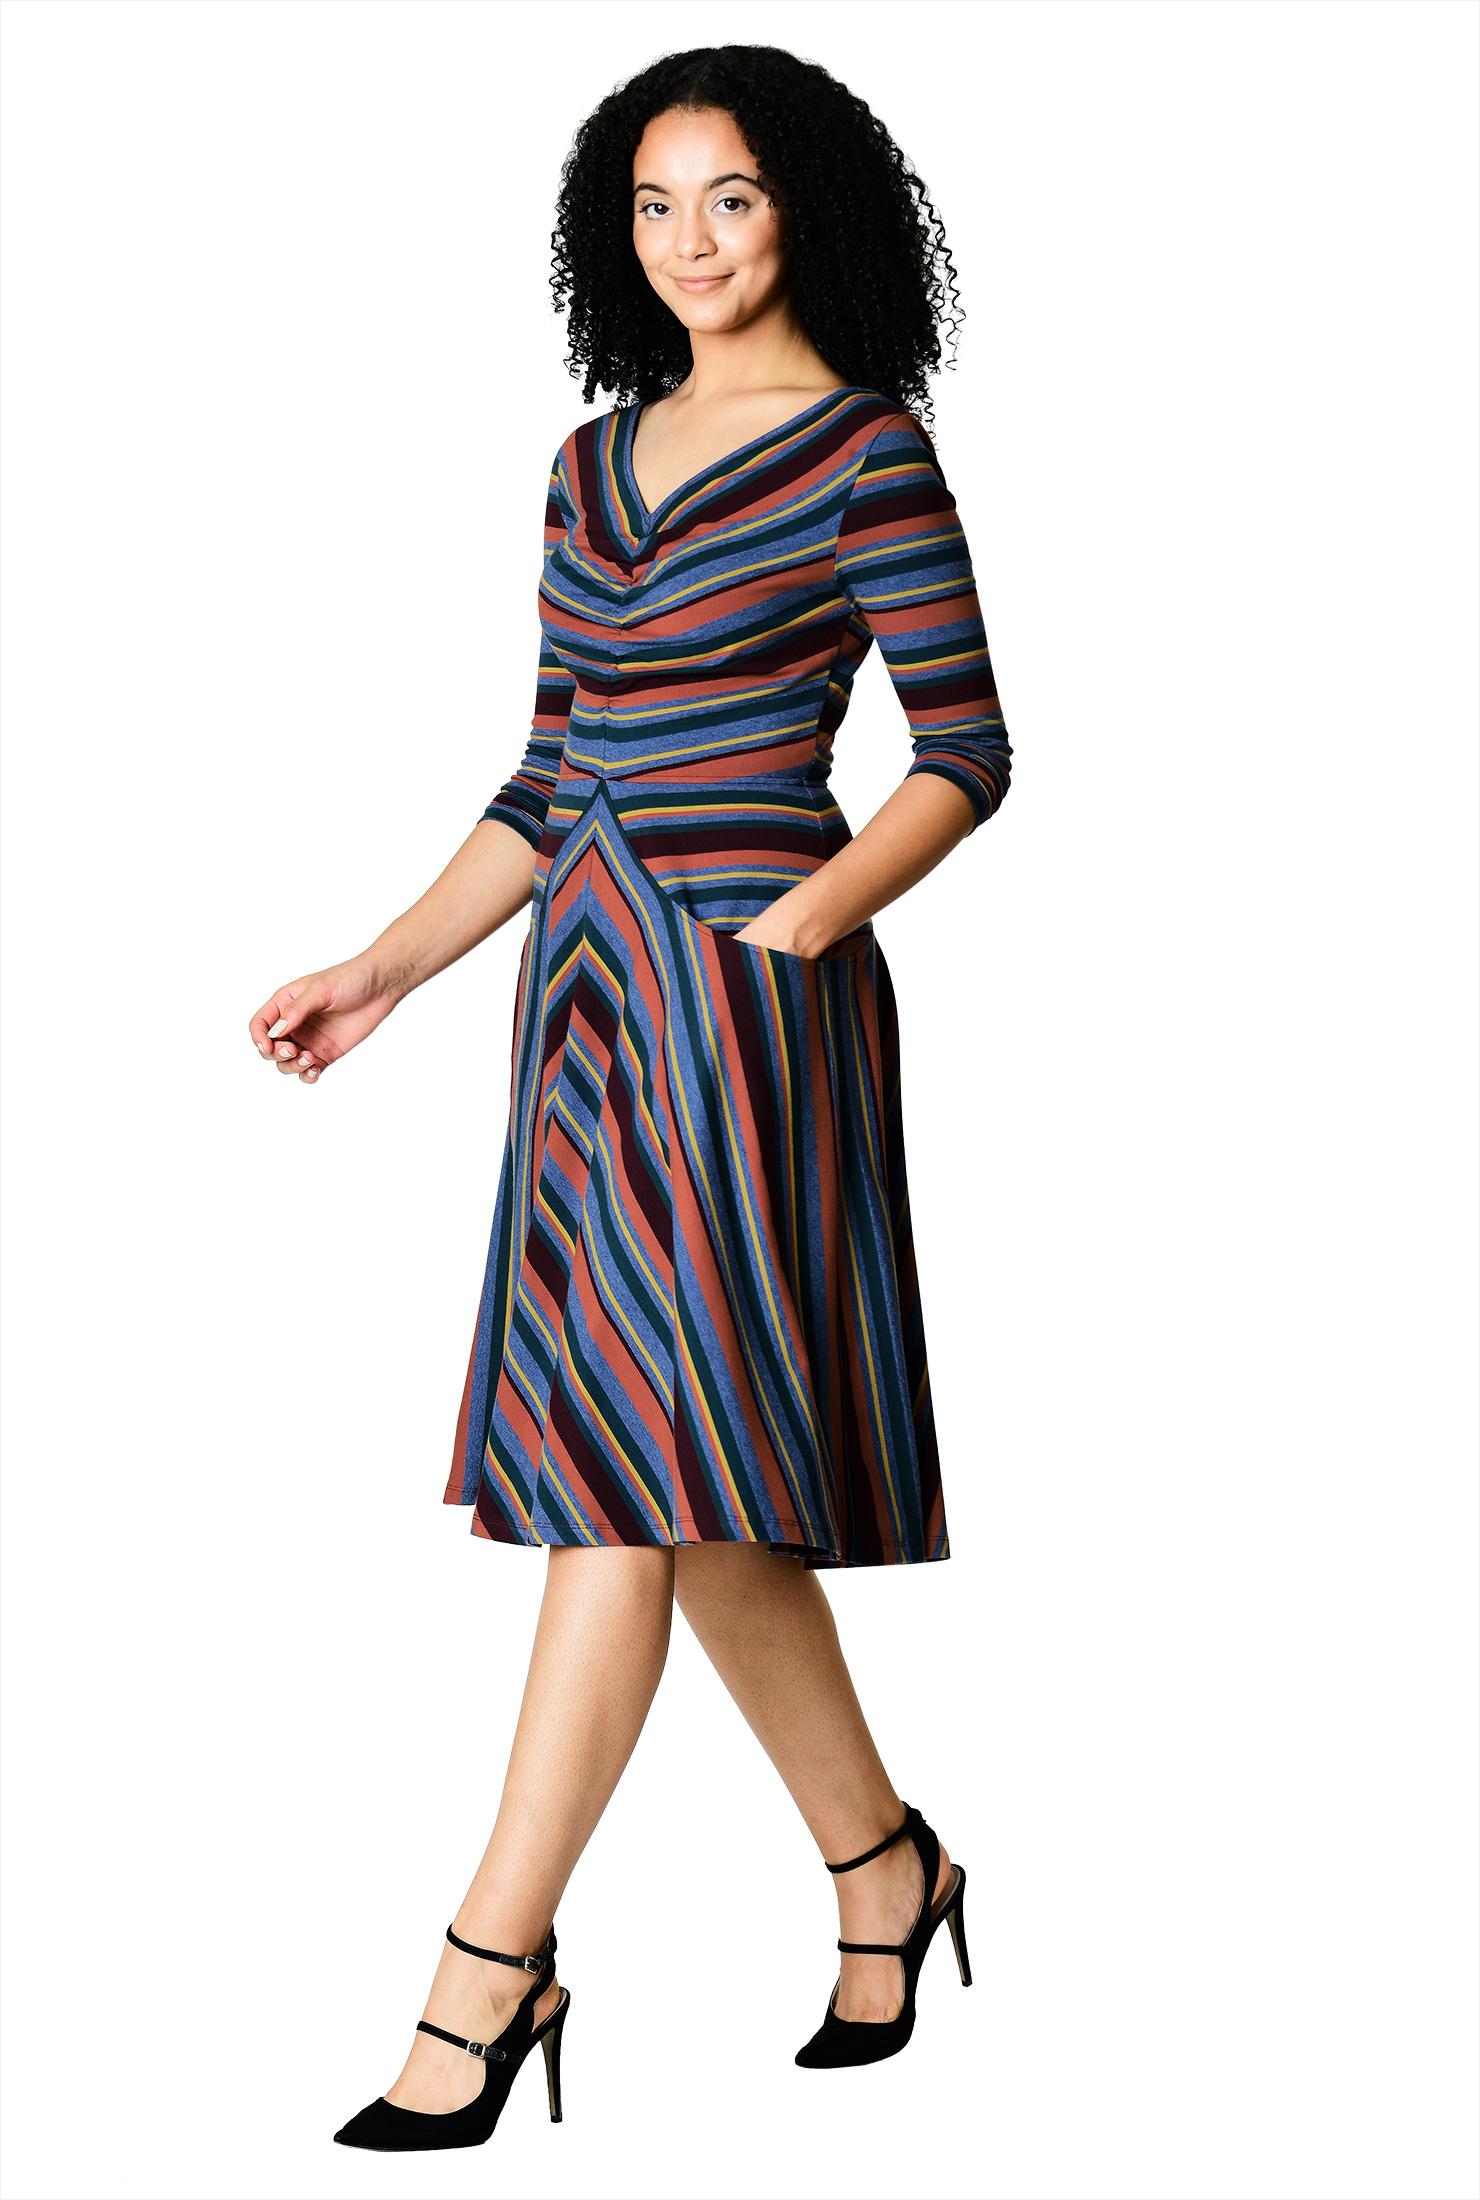 38ad6576ff6 Women s Fashion Clothing 0-36W and Custom